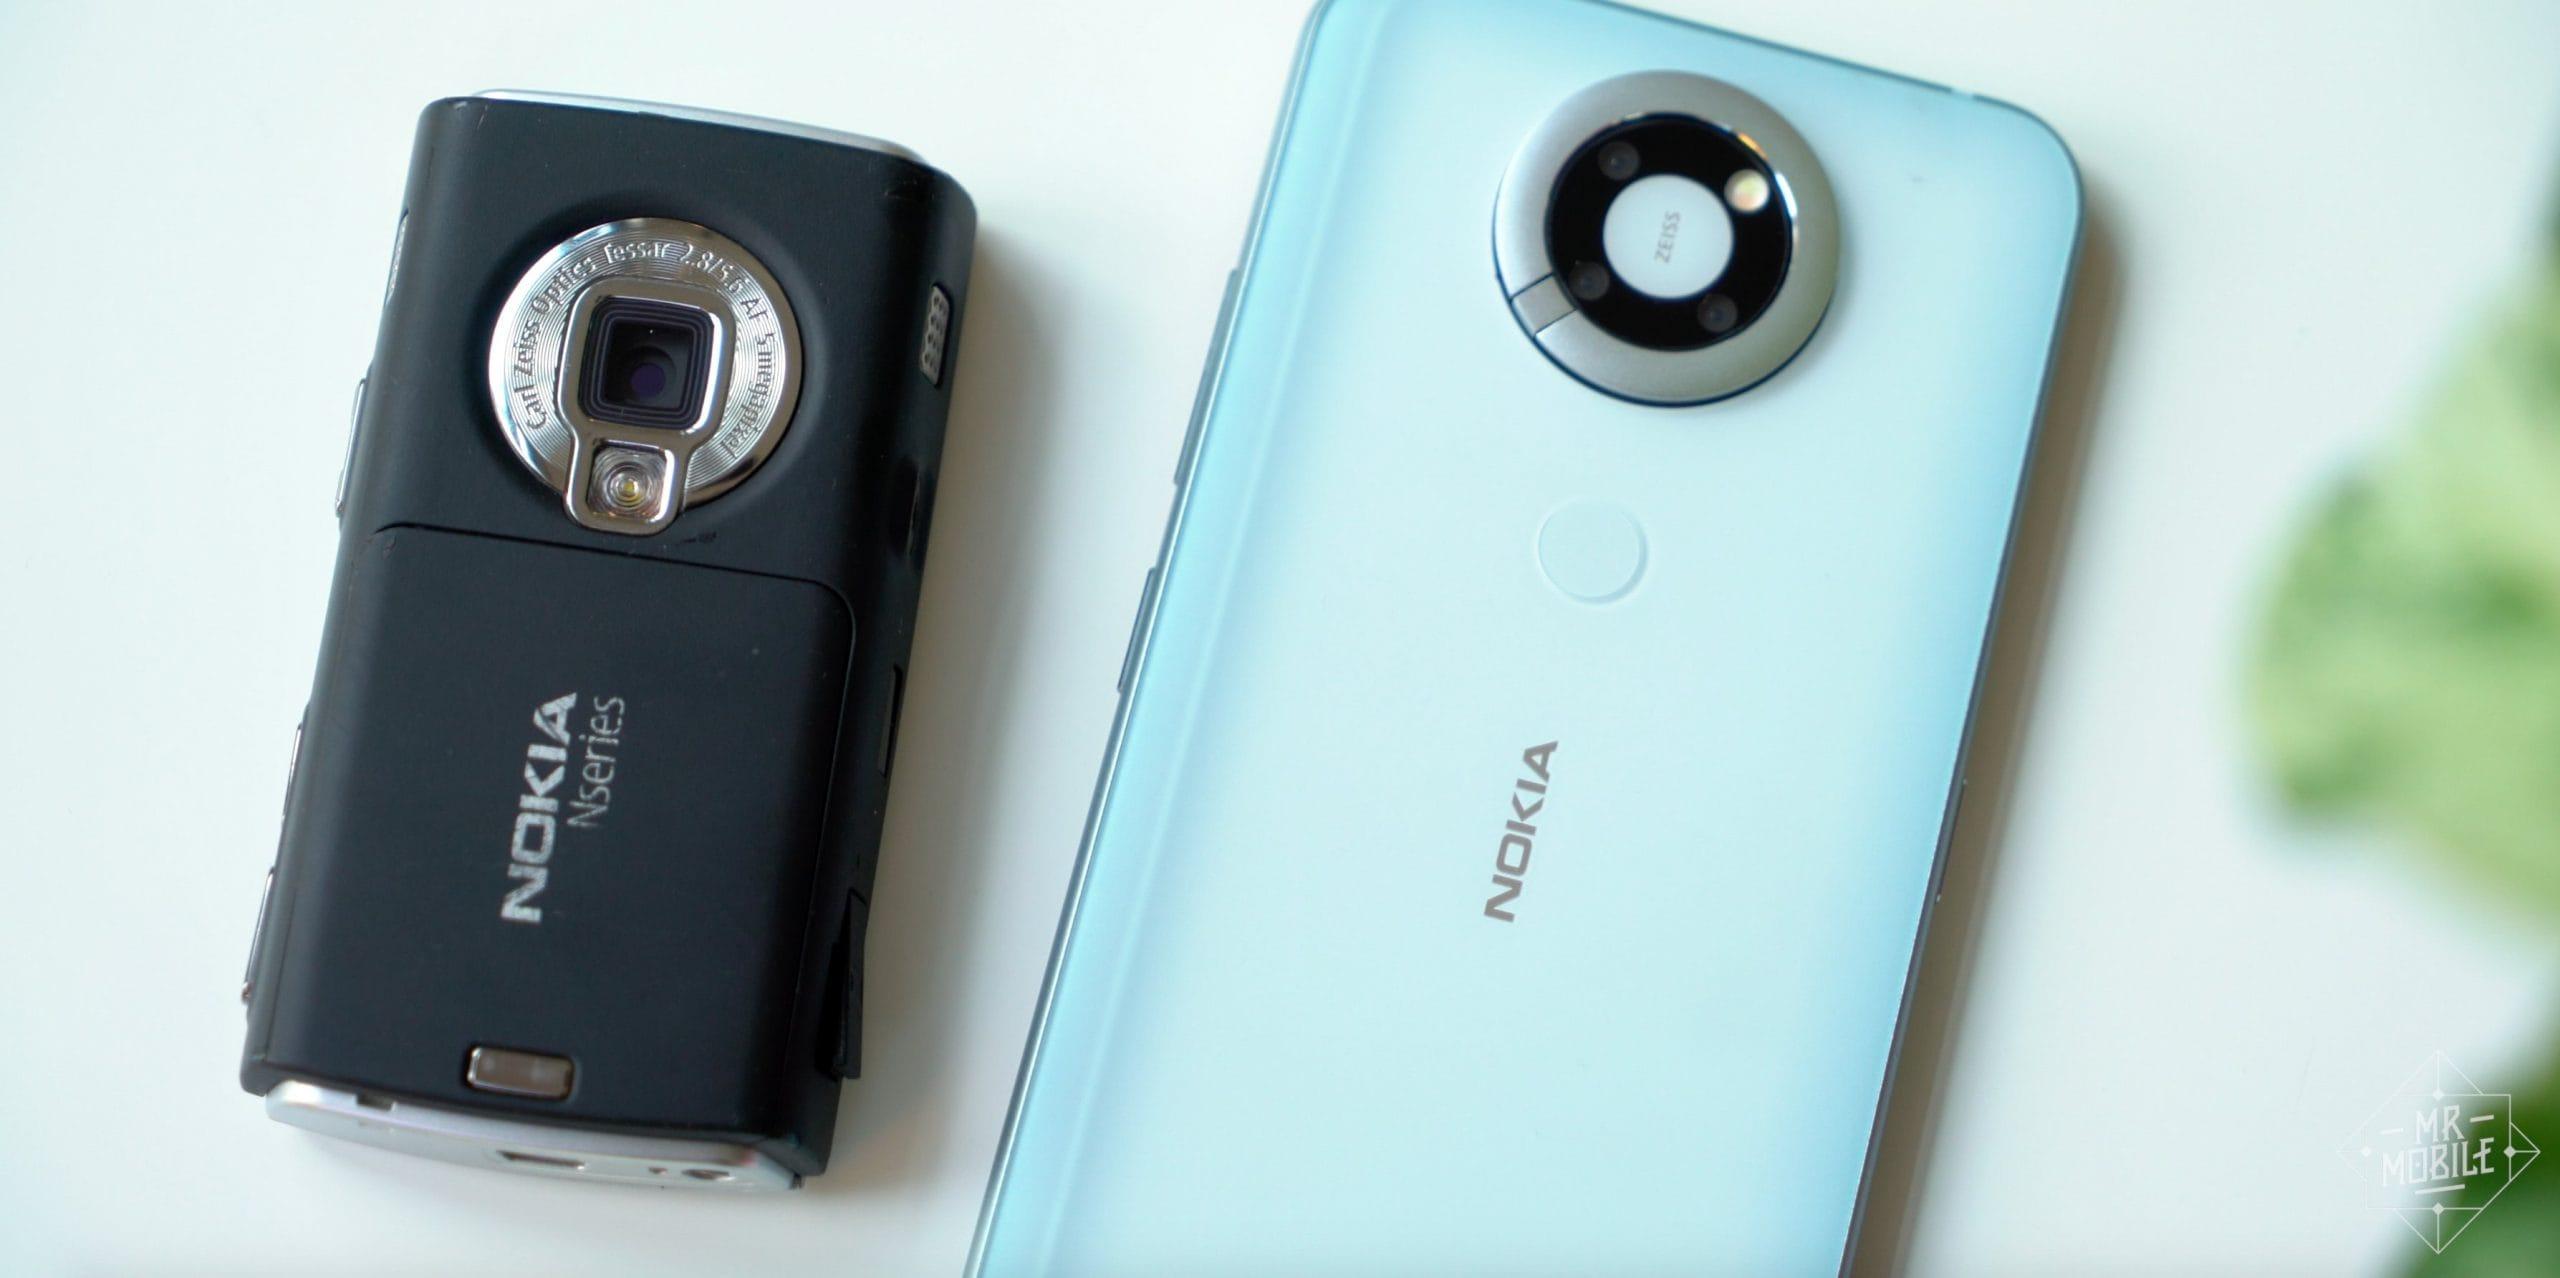 Прототип Nokia n95